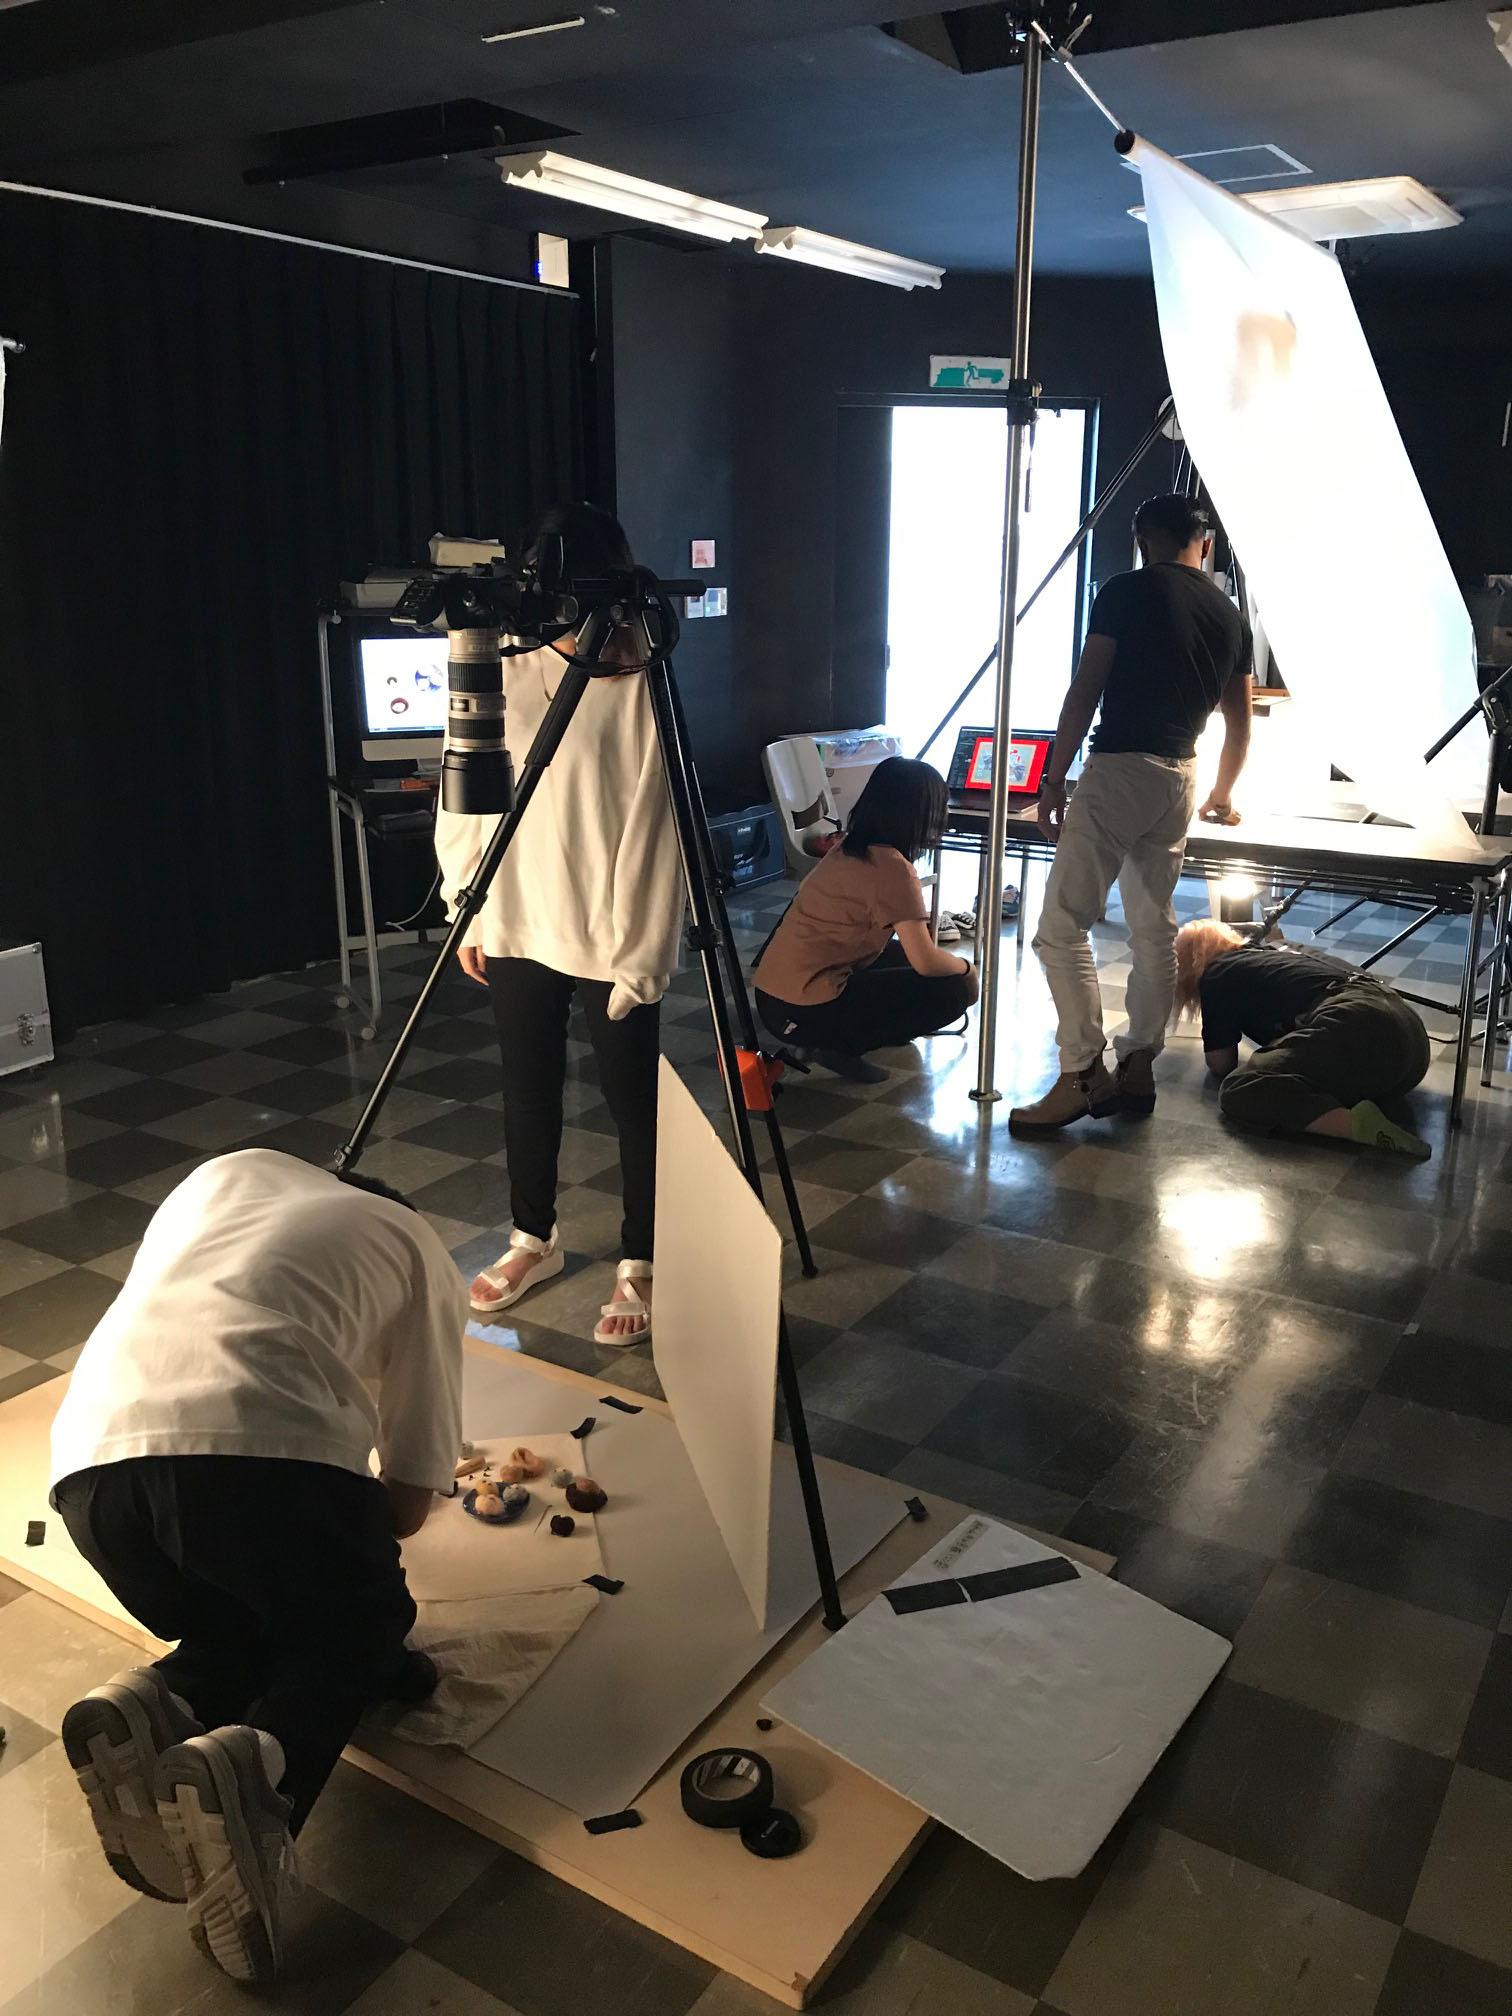 写真映像科&雑貨デザイン科 合同授業